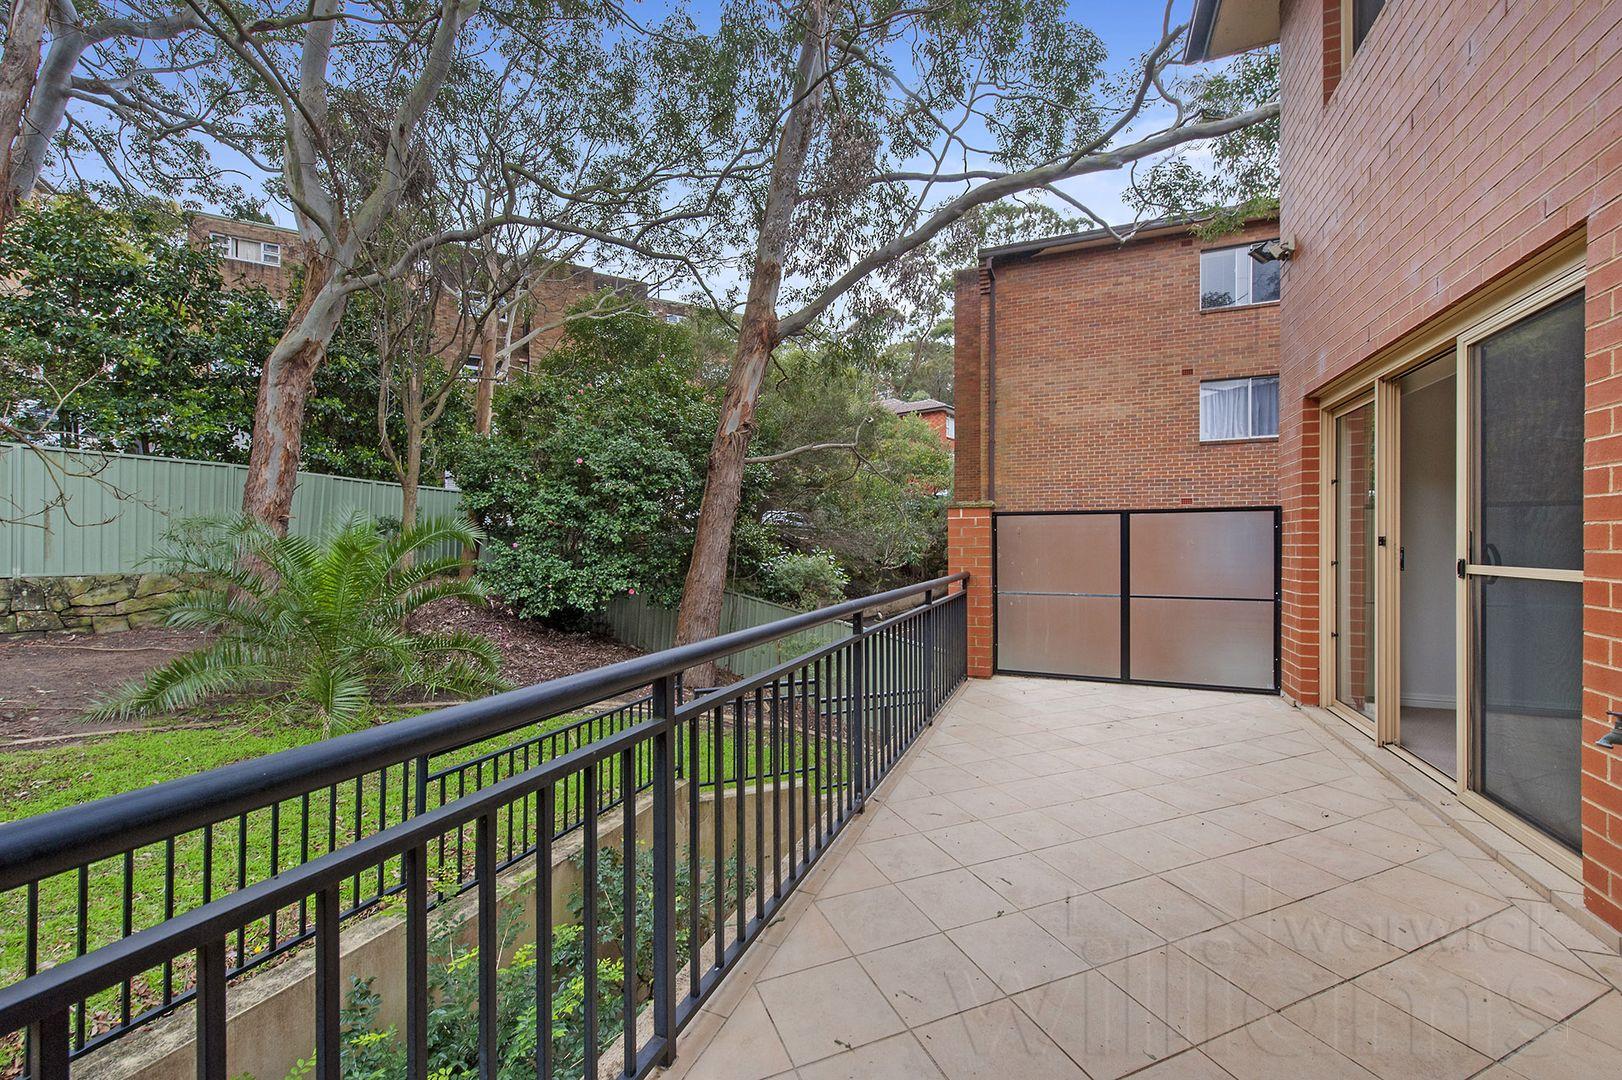 7/1-5 Huxtable Avenue, Lane Cove North NSW 2066, Image 0